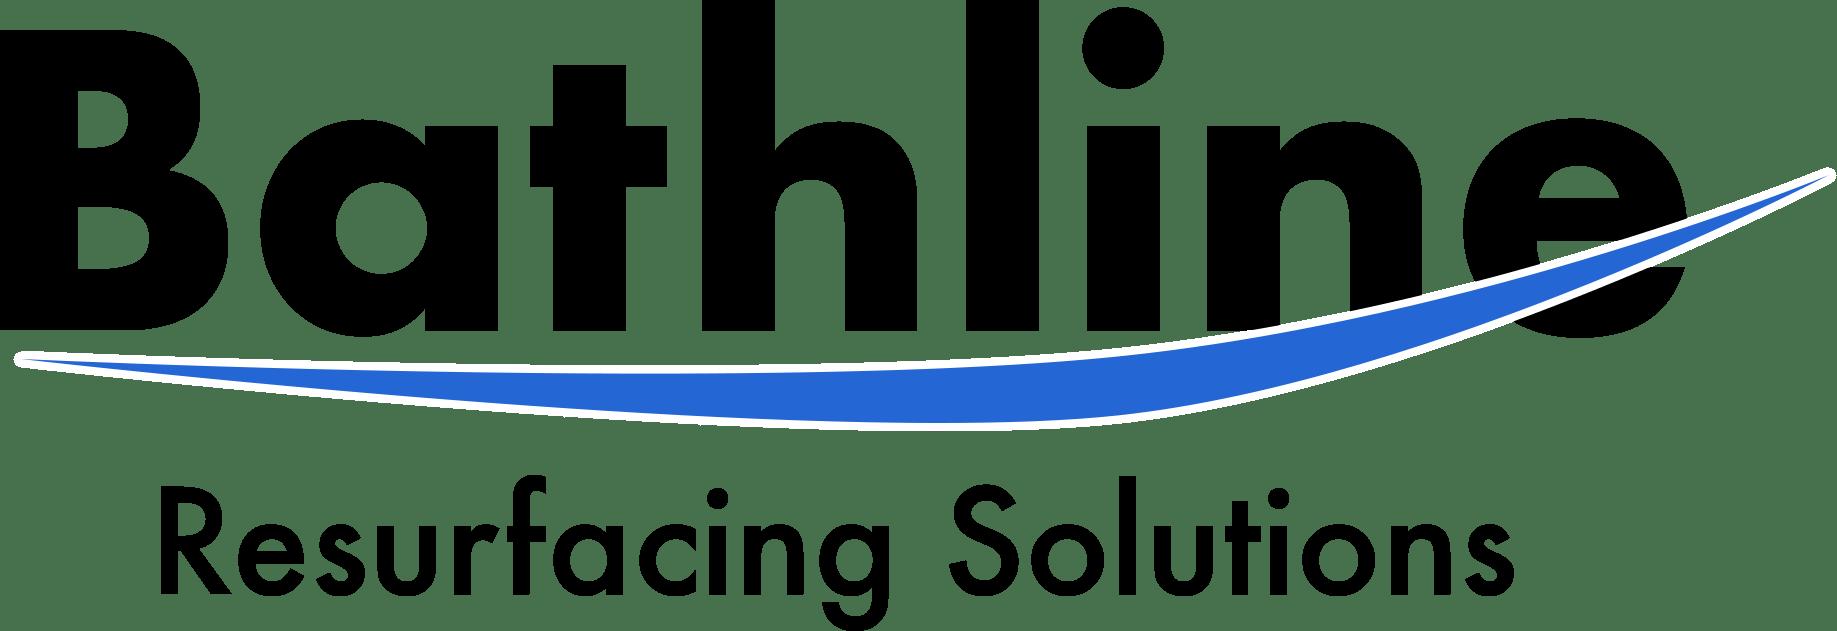 Bathline Resurfacing Supplies